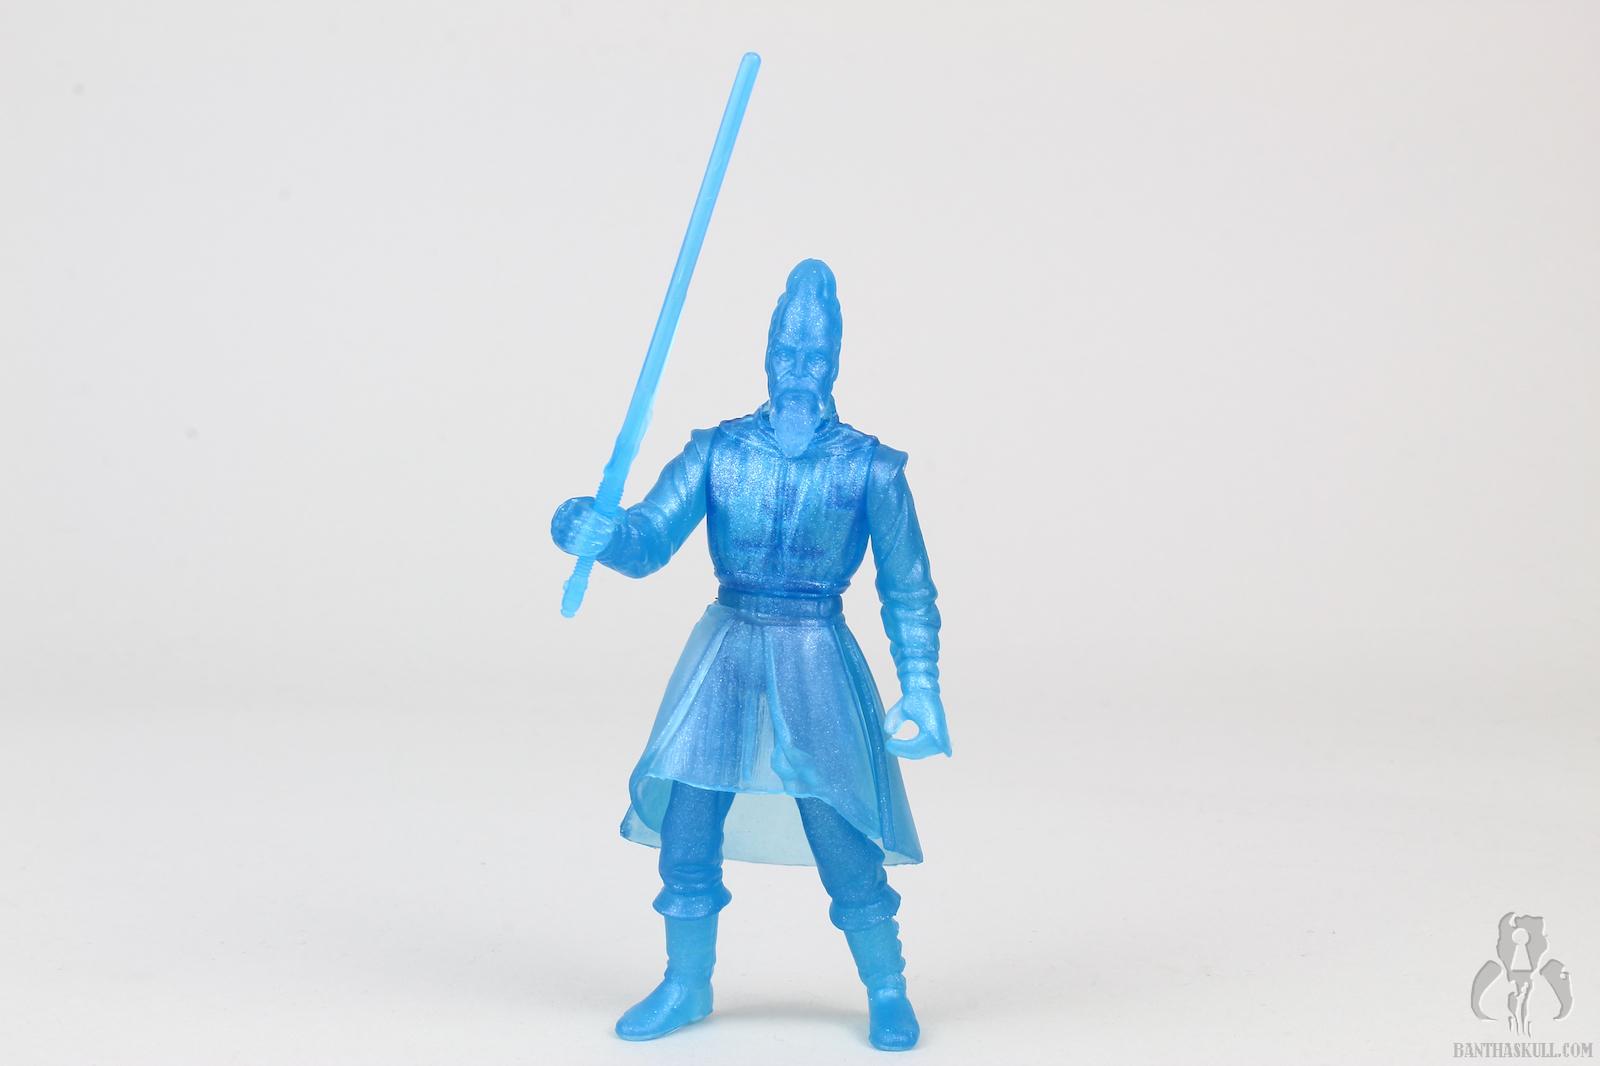 Spielzeug HOLOGRAPHIC KI-ADI-MUNDI STAR WARS SAGA 027